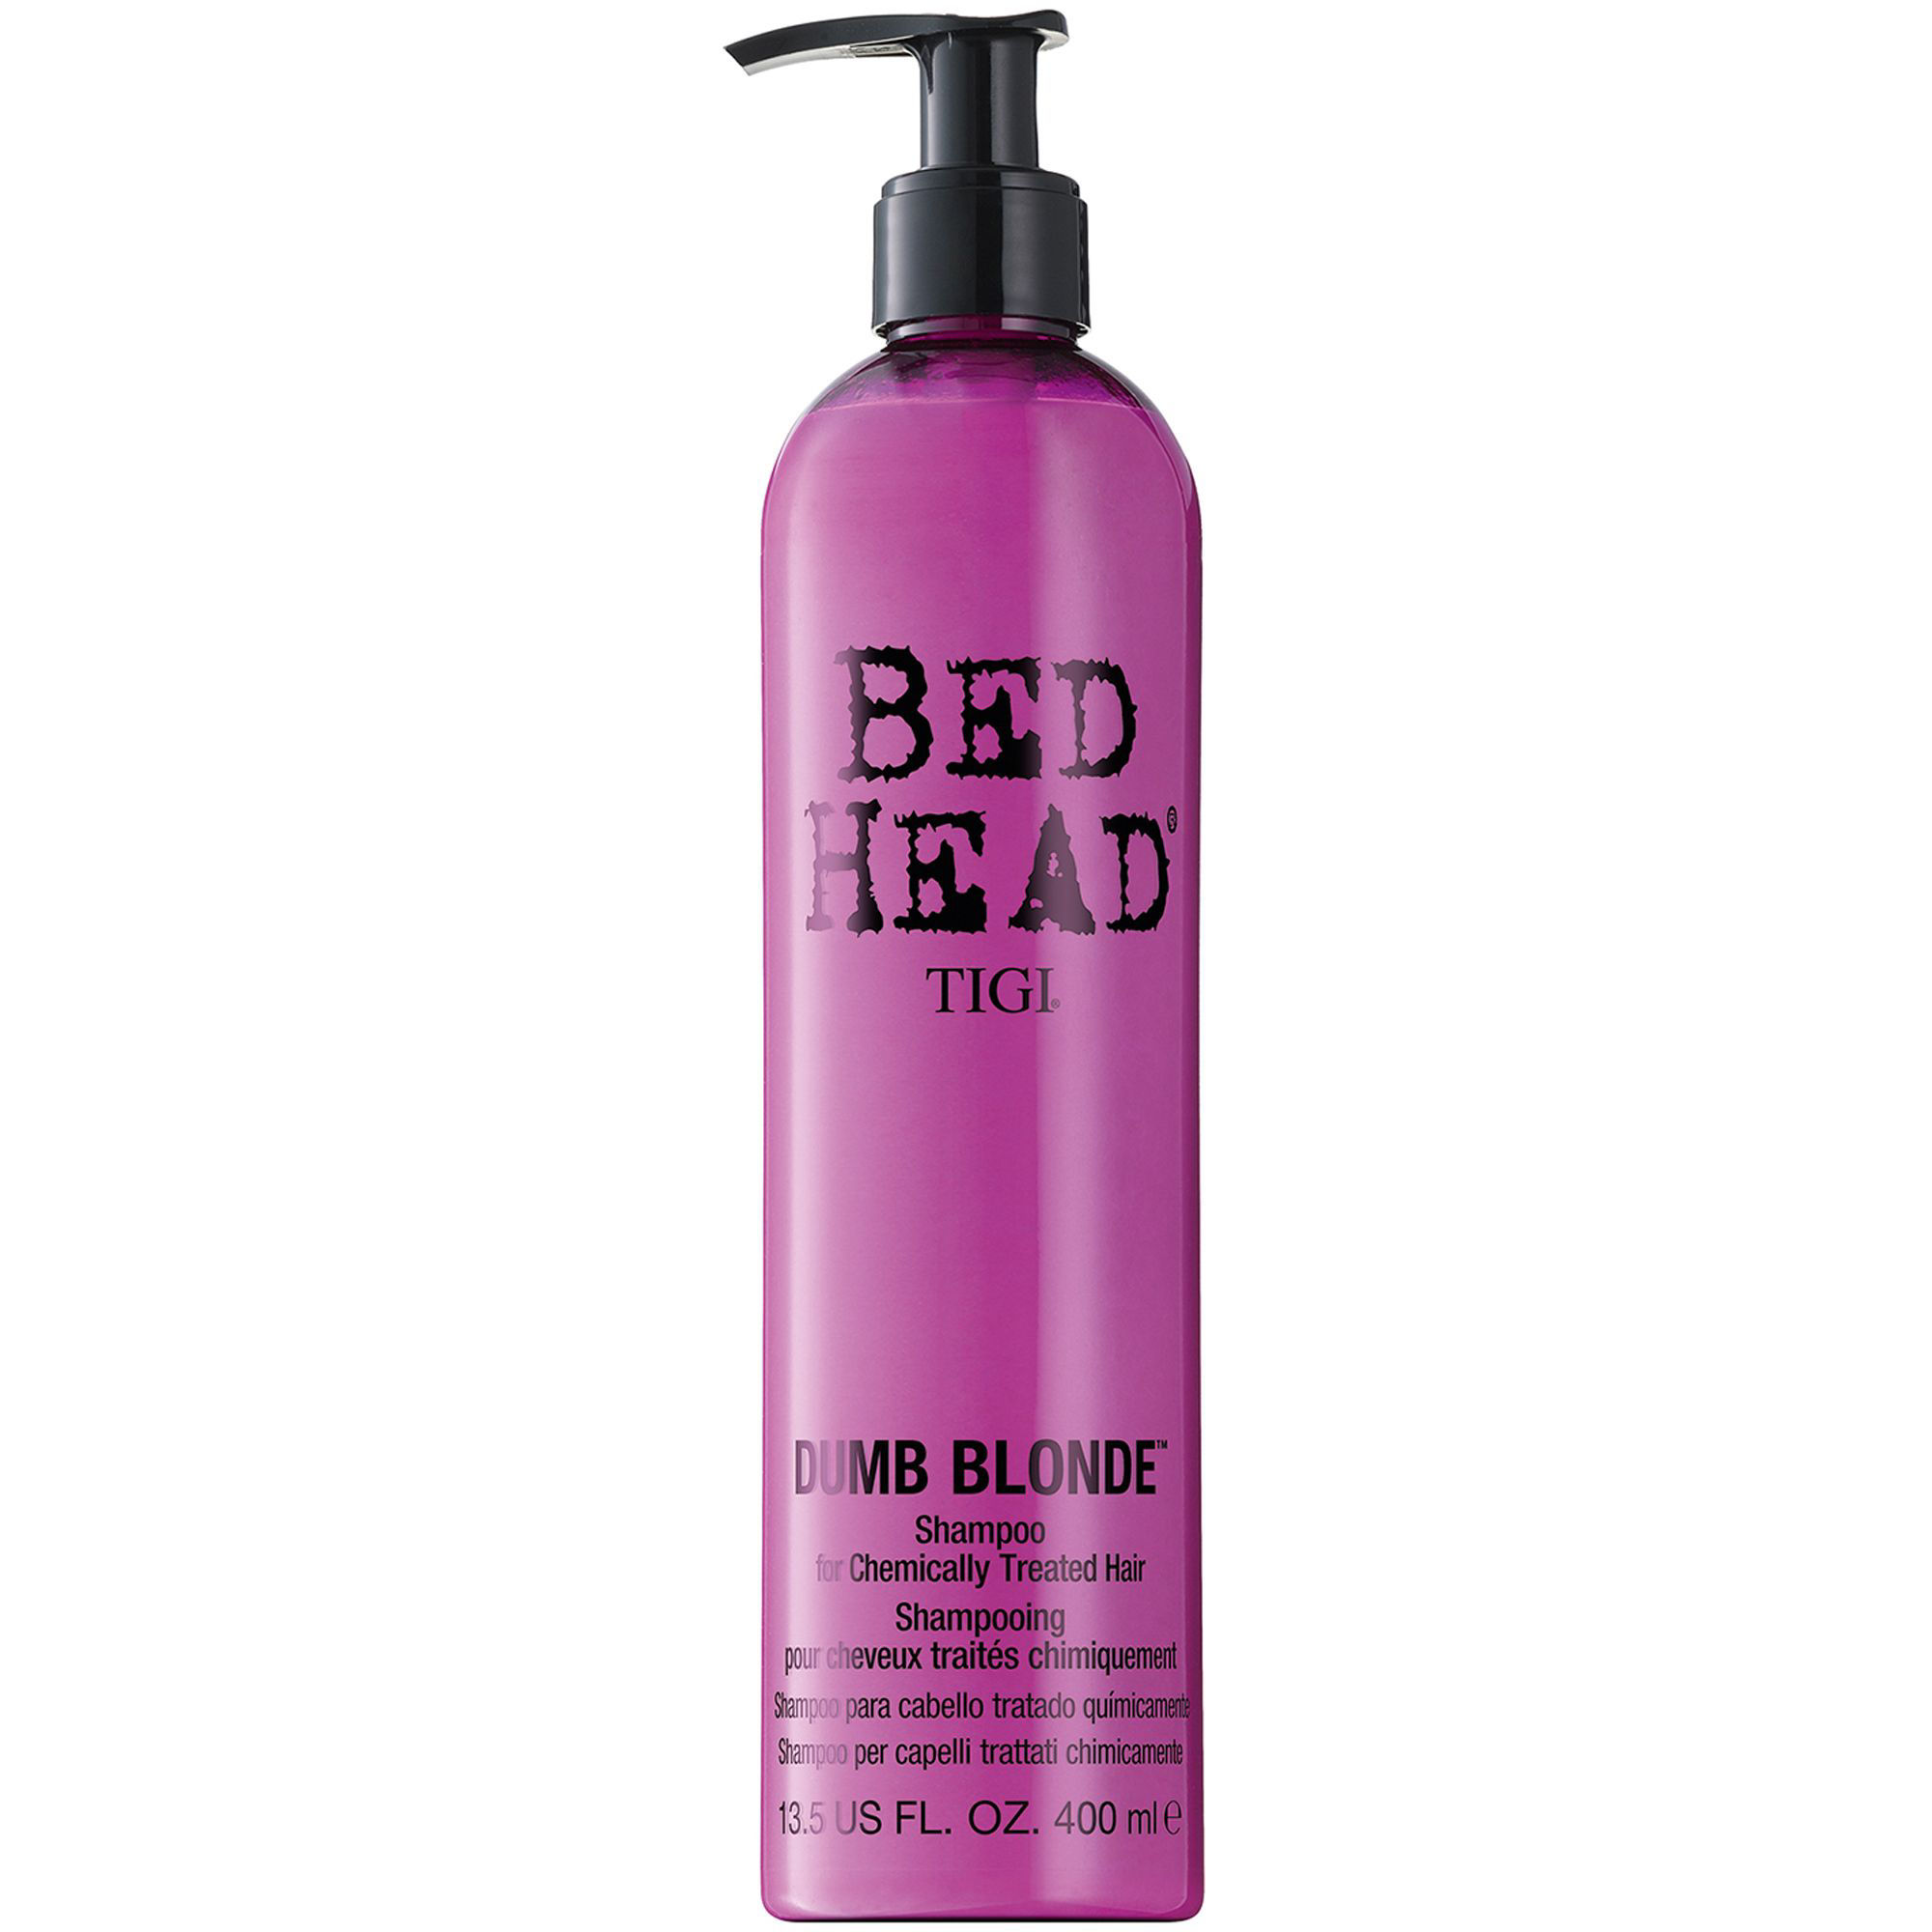 TIGI Dumb Blonde Treated Hair Shampoo 400ml